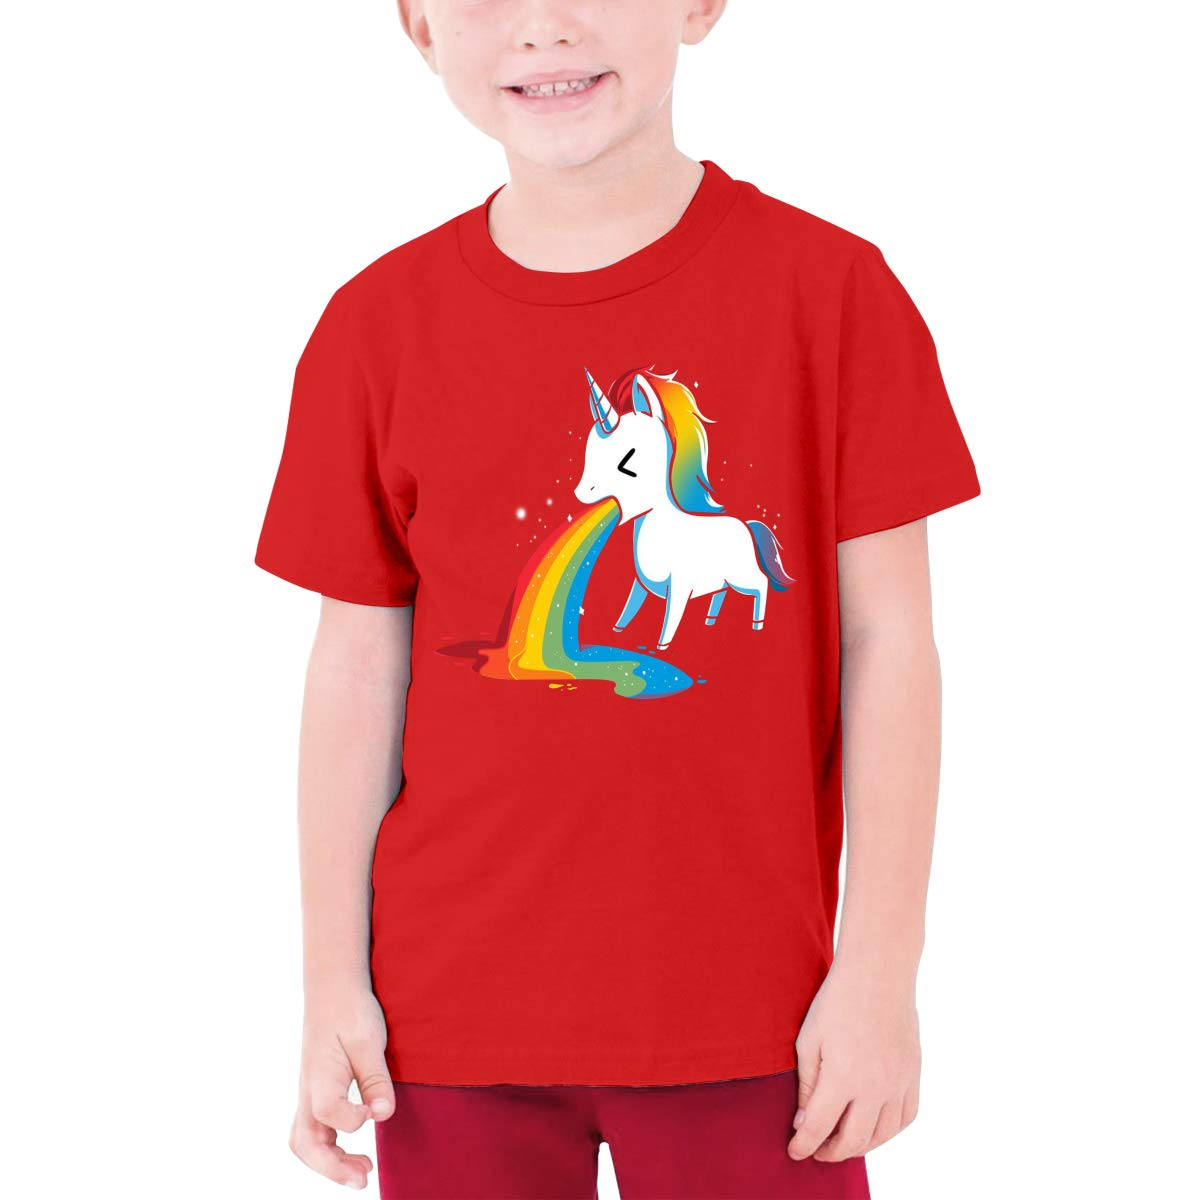 Youth Graphic Tshirts Teenage Boys Girls Short Sleeve T-Shirt Rainbows Unicorn Printed Round Collar T Shirt Tees Tops